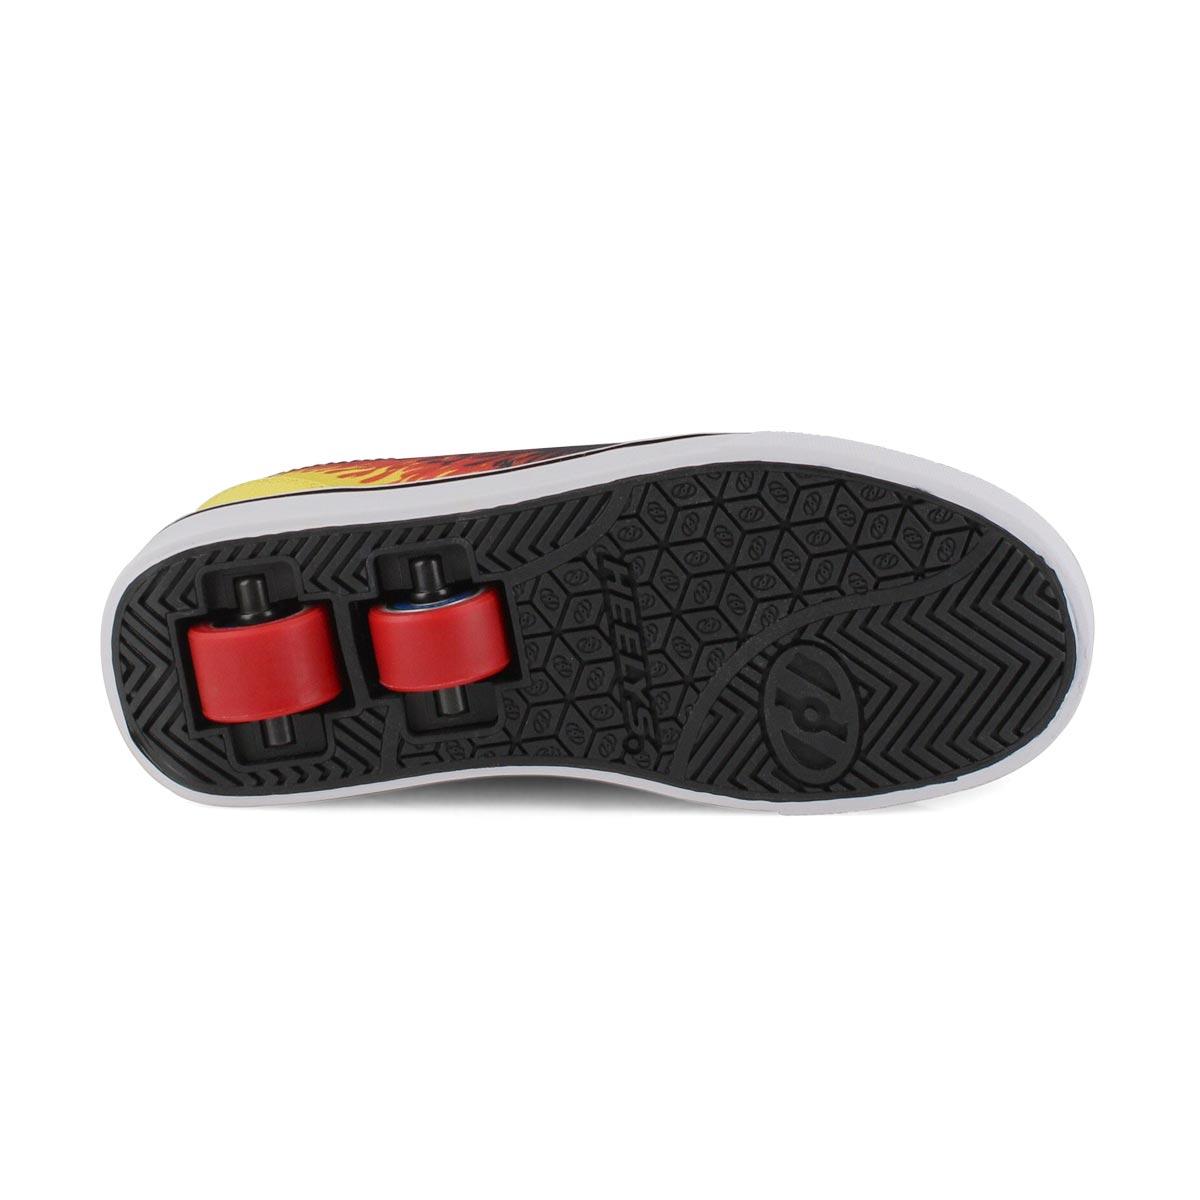 Bys Pro 20 X2 blk/flame skate sneaker